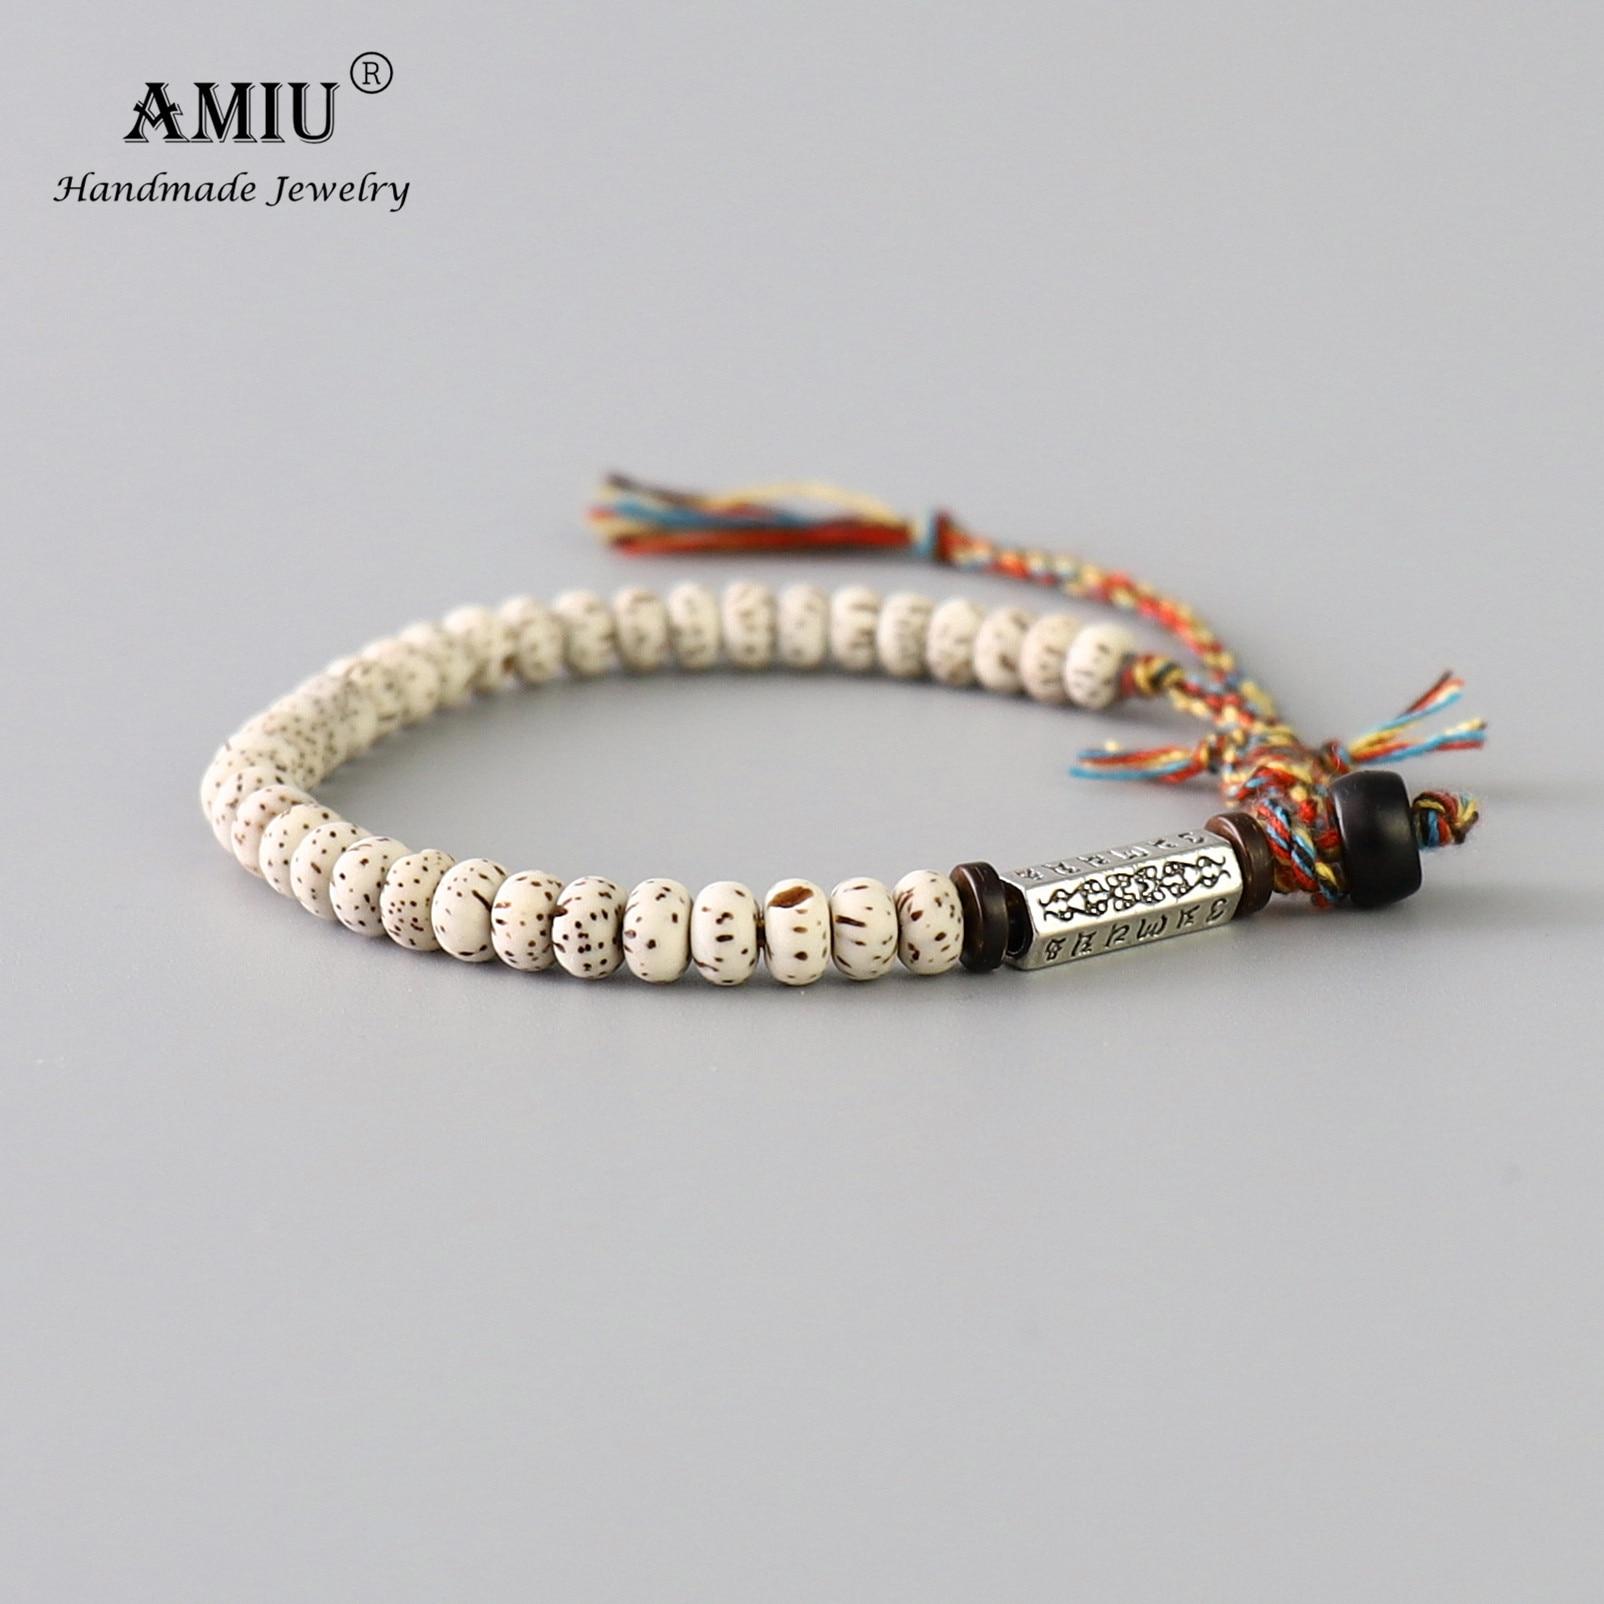 AMIU Tibetan buddhist Braided Cotton Thread Lucky Knots bracelet Natural Bodhi Beads Carved Amulet Handmade Bracelet For Men